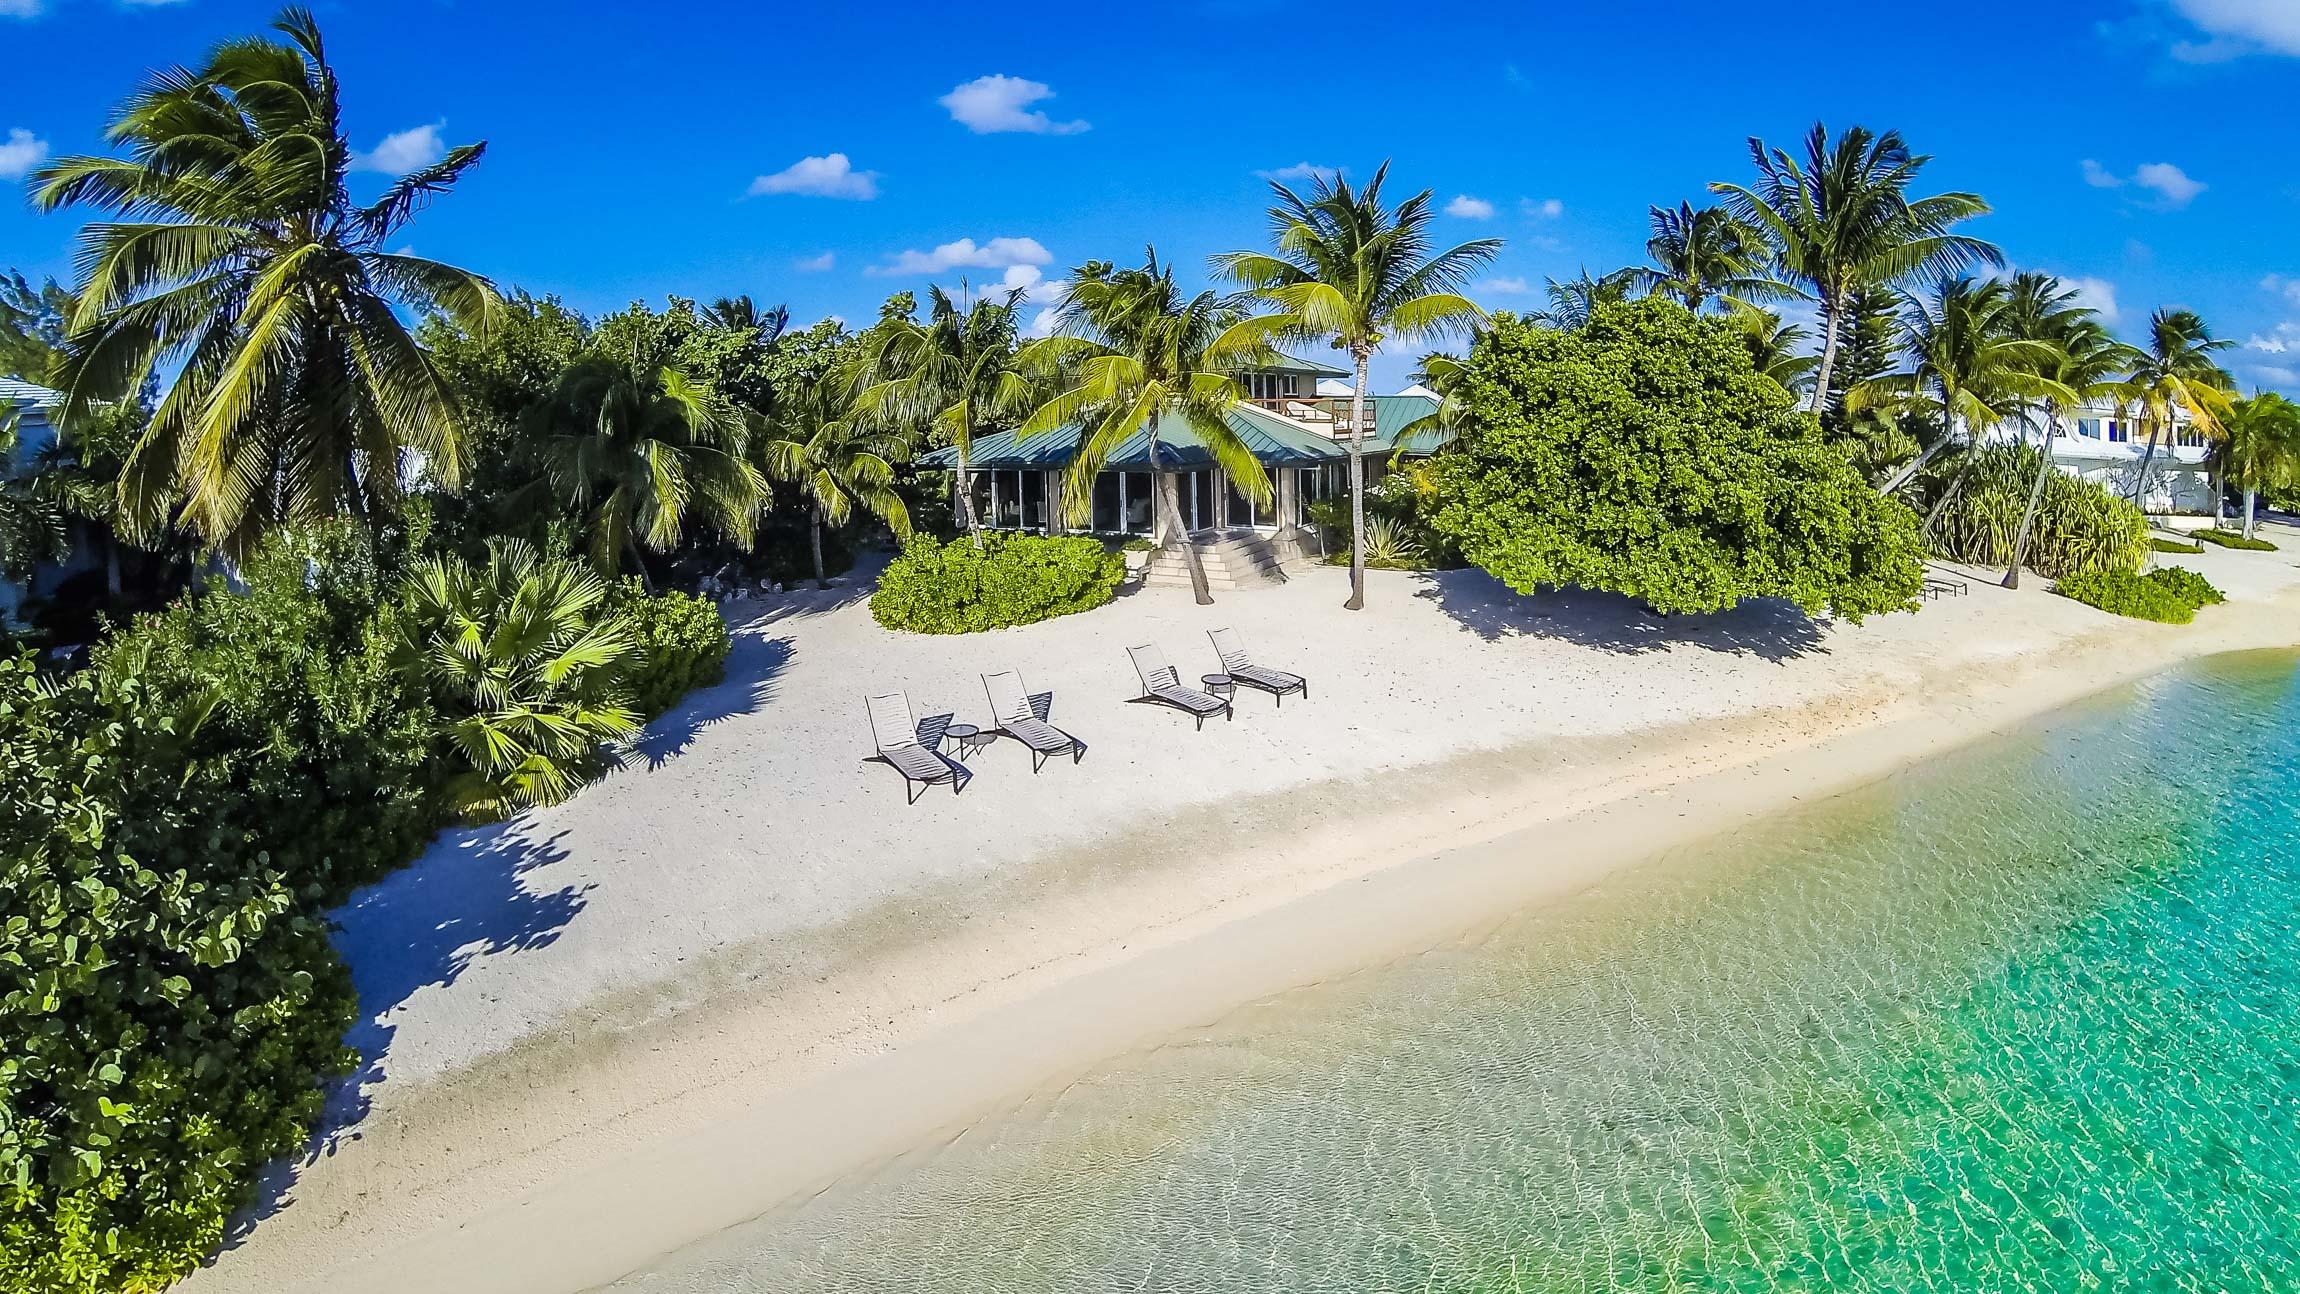 Tarasand - Rum Point, North Side, Cayman Islands